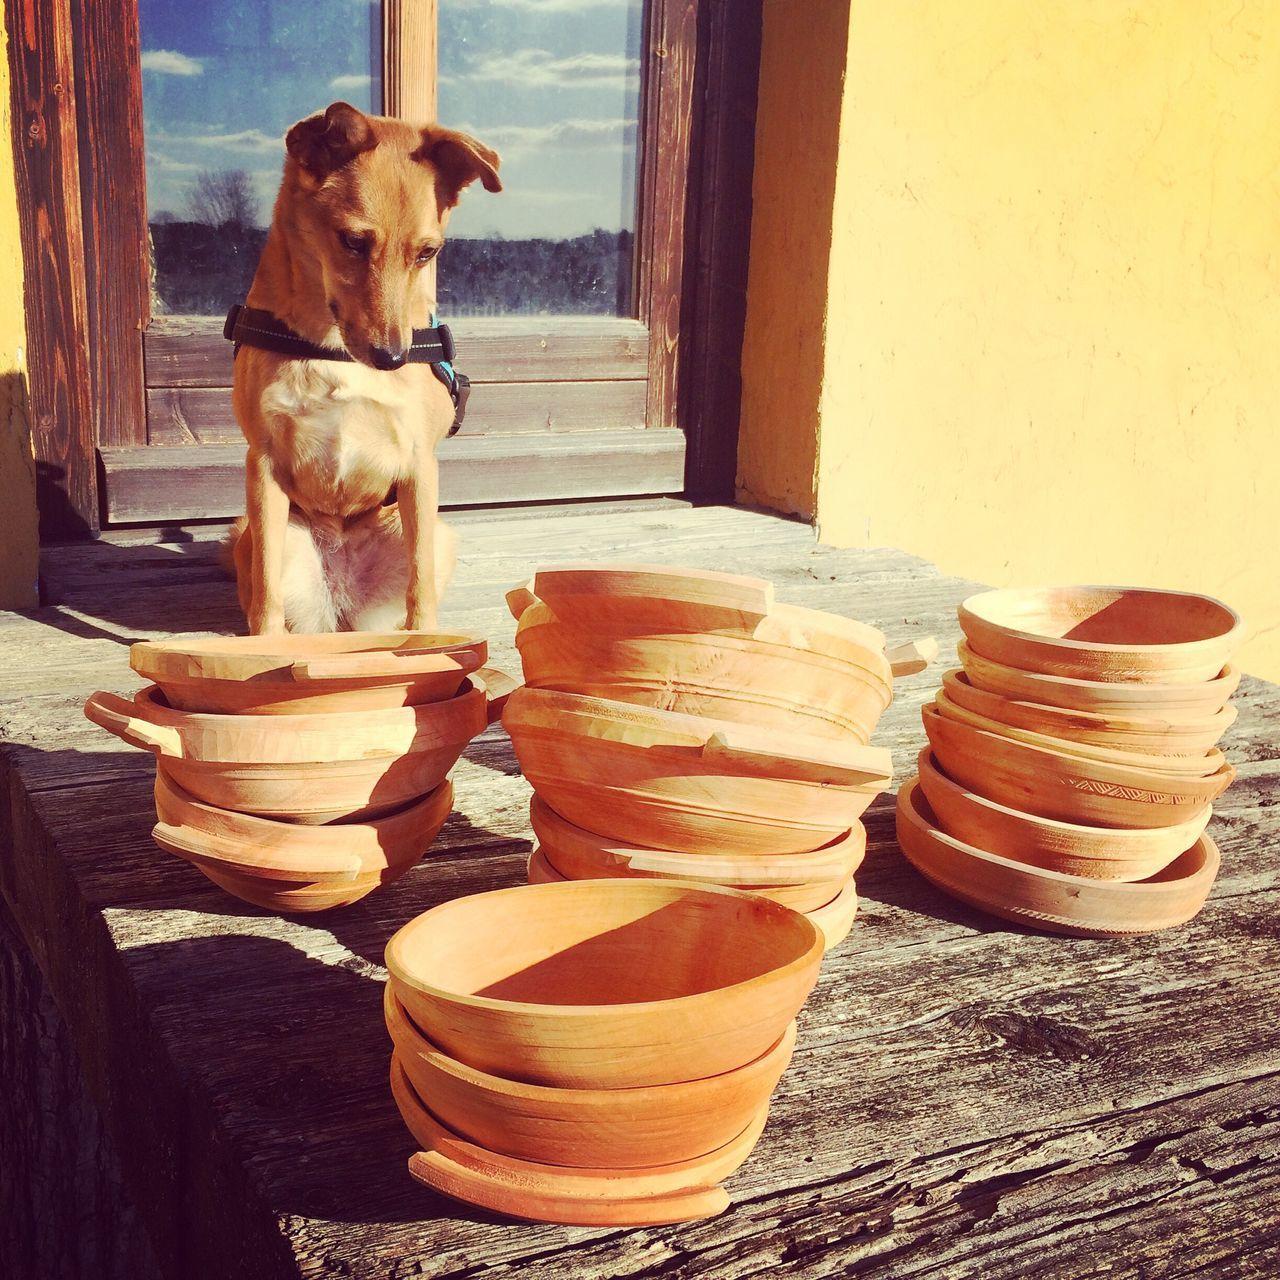 Muki és a tálak Animal Themes Dog One Animal Bowl Bowls Wood Wood - Material Wooden Pets No People Traditional